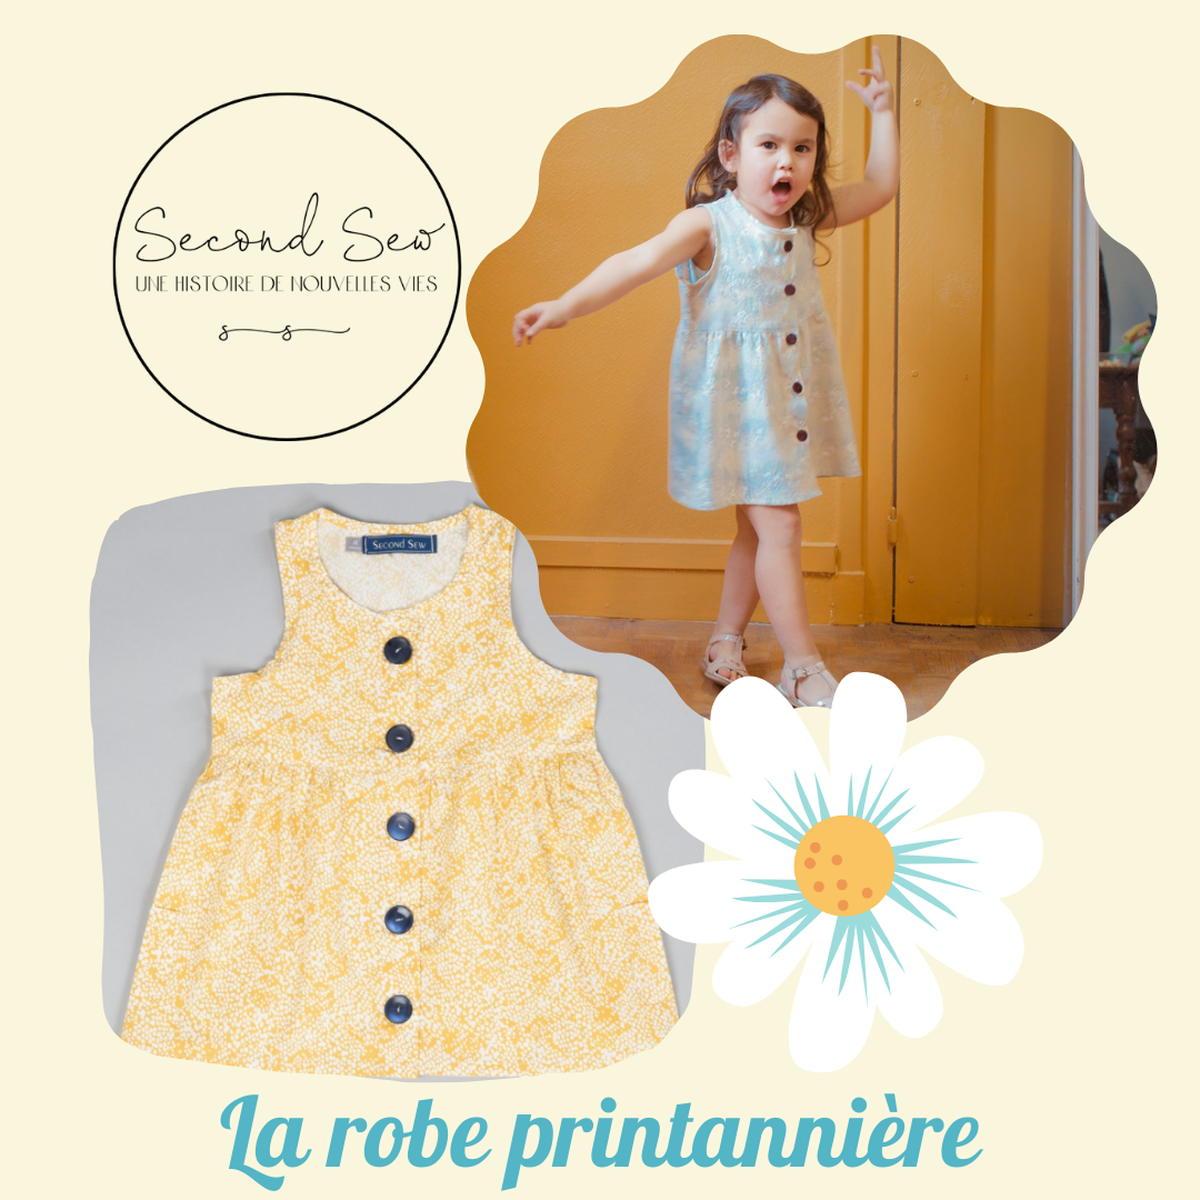 SloWeAre - 6 idées pour habiller les enfants - éco-responsble - robe jaune - Petite fille - Second Sew - - upcycling - Made in France